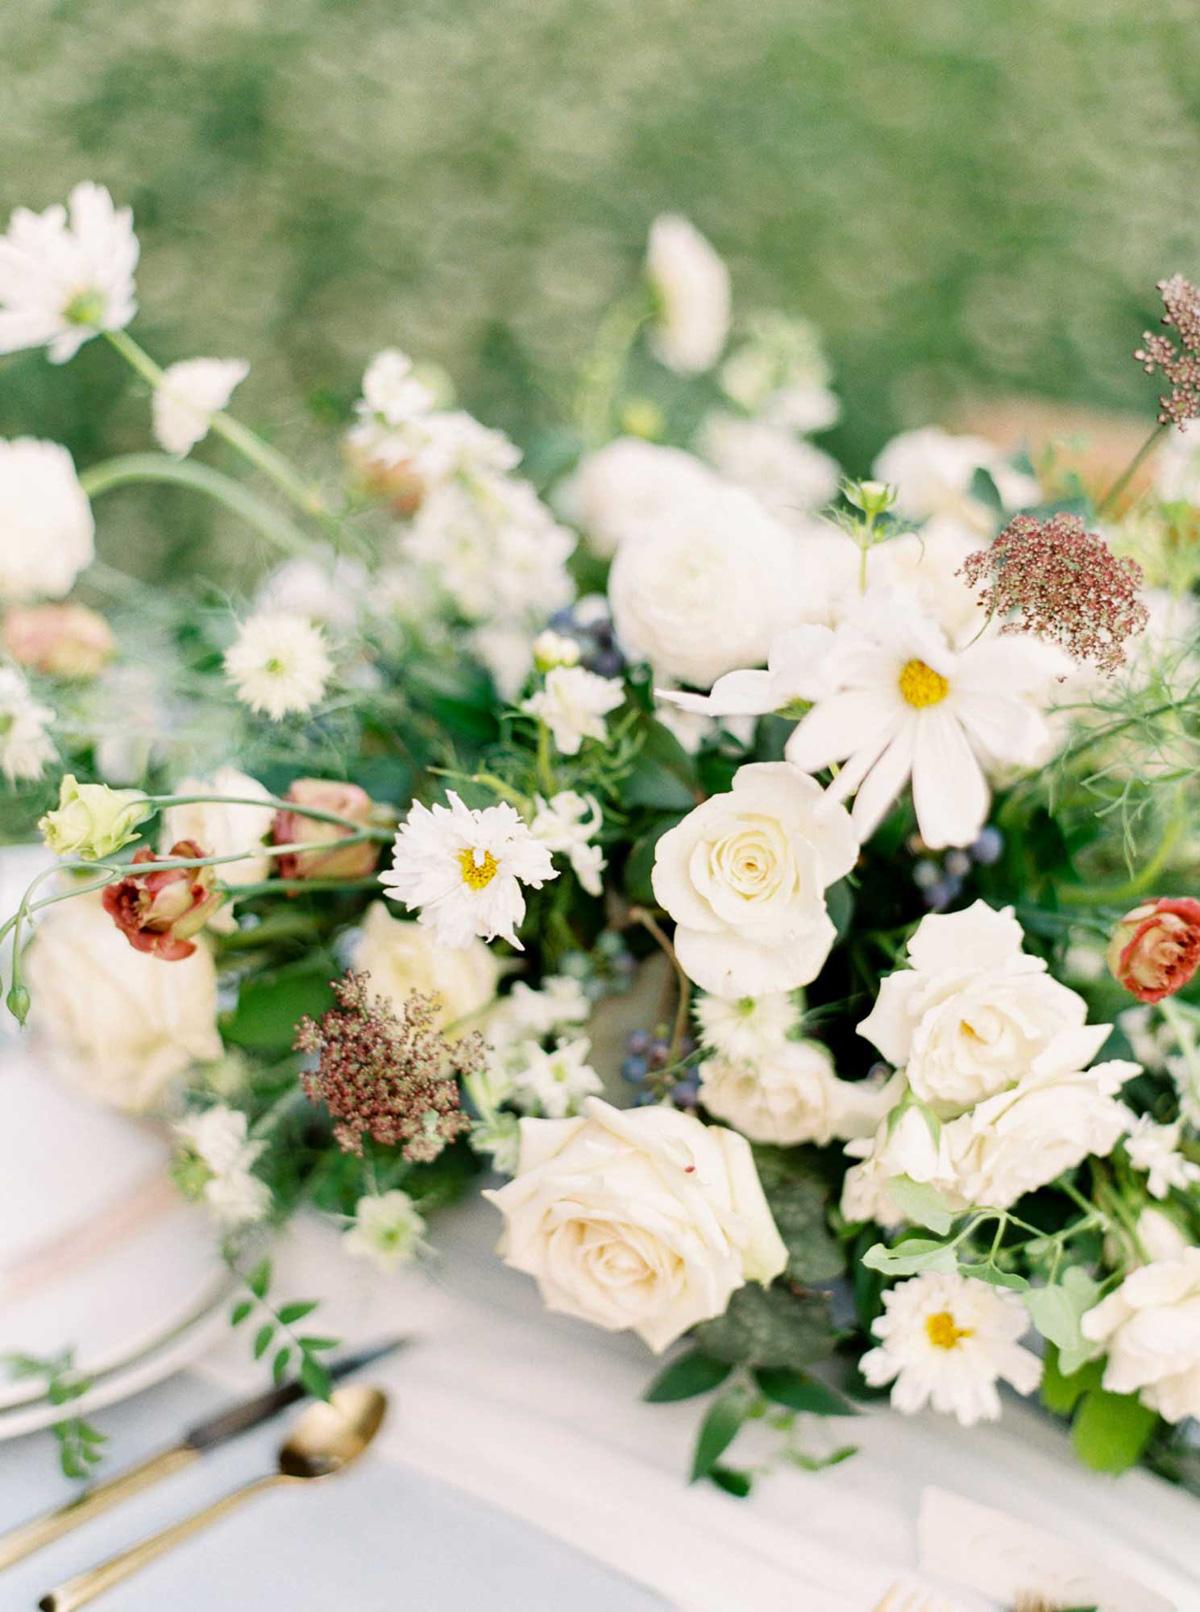 kayla-yestal-vineyard-bride-swish-list-woodland-weddings-niagara-wedding-editorial-71.jpg